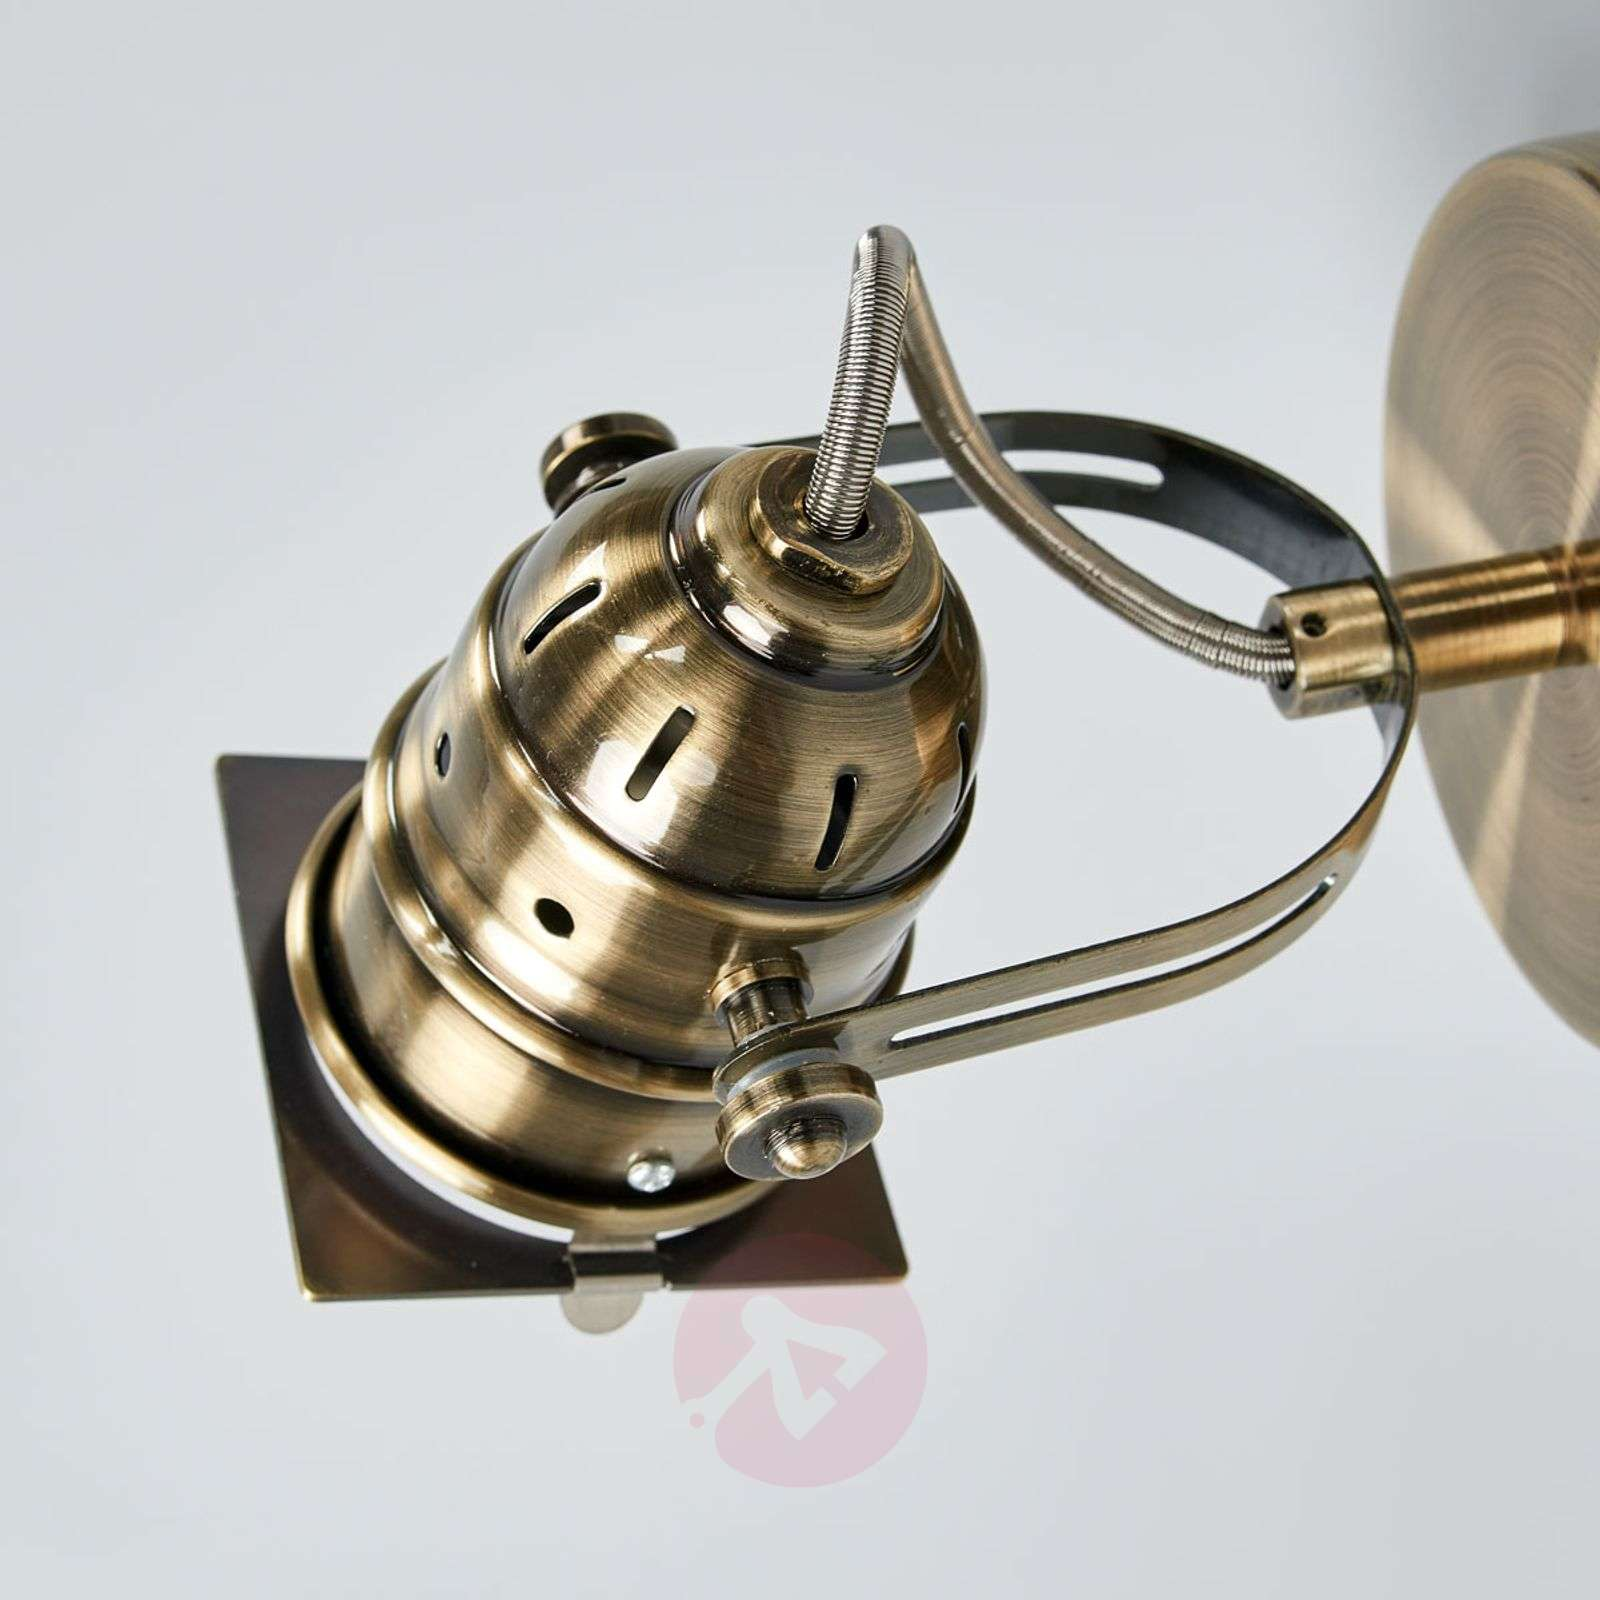 Janek LED spotlight in antique brass, GU10-9639077-08